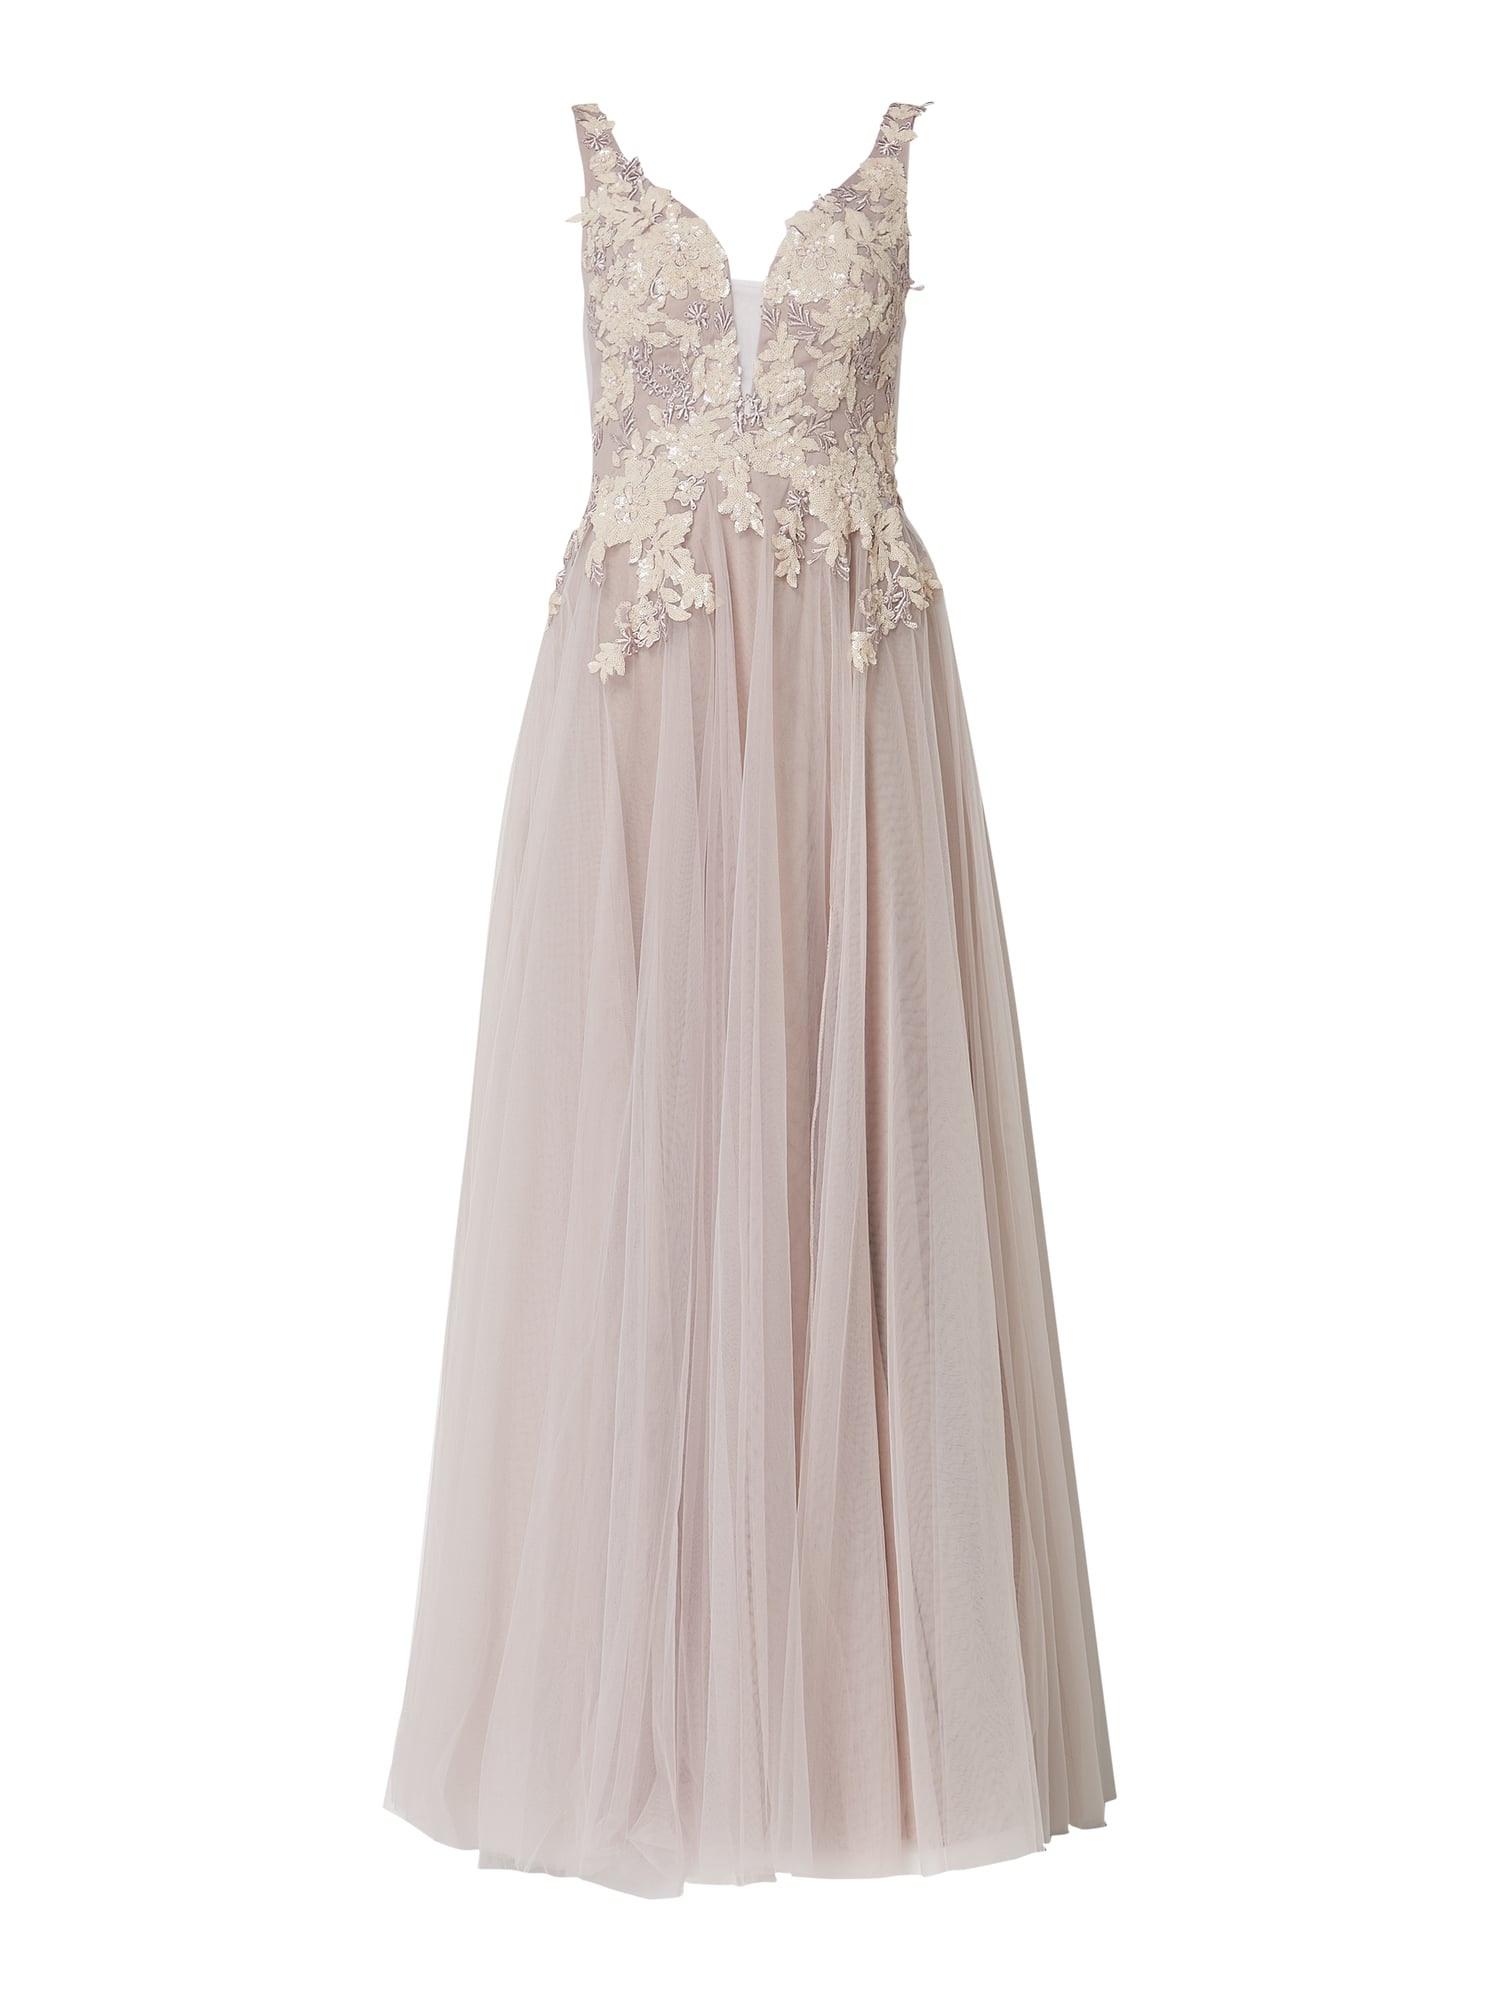 Designer Perfekt Mascara Abendkleid Galerie17 Perfekt Mascara Abendkleid für 2019